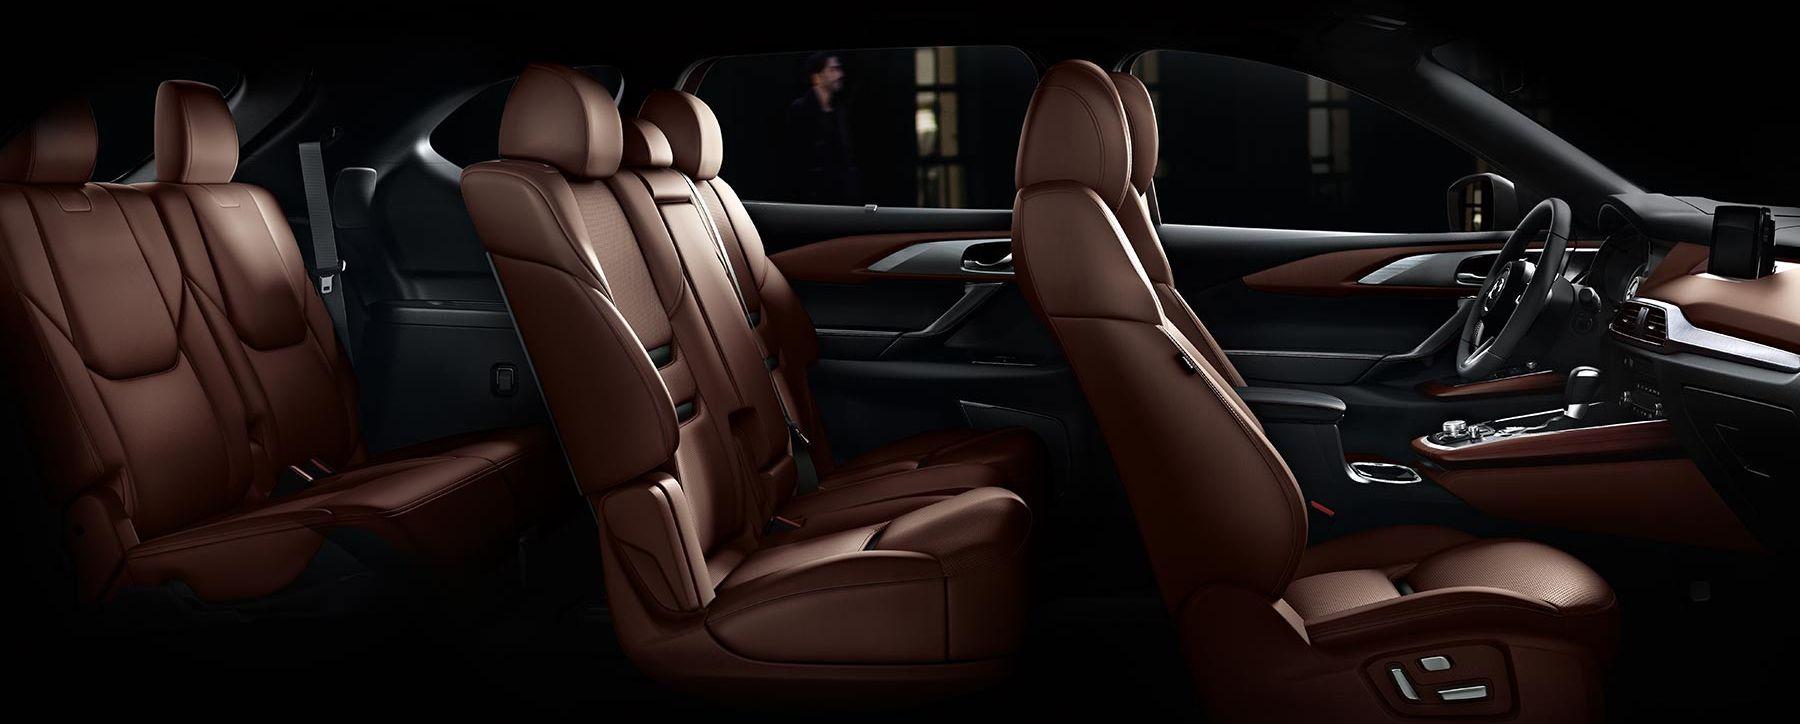 Plush Seating in the 2019 Mazda CX-9!